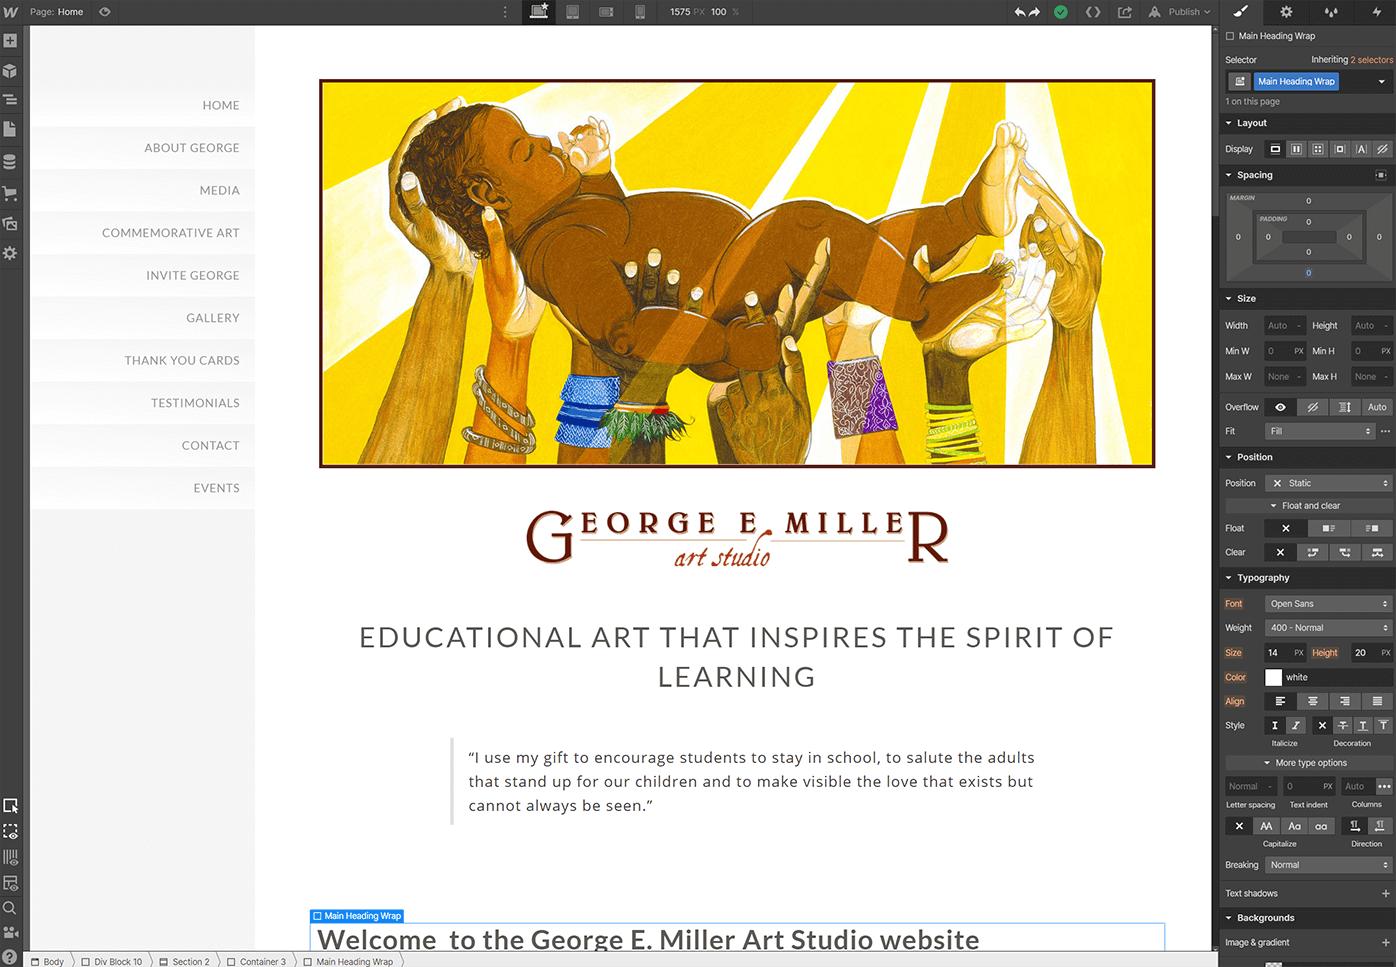 aroundKent website design services. George E. Miller Art Studio